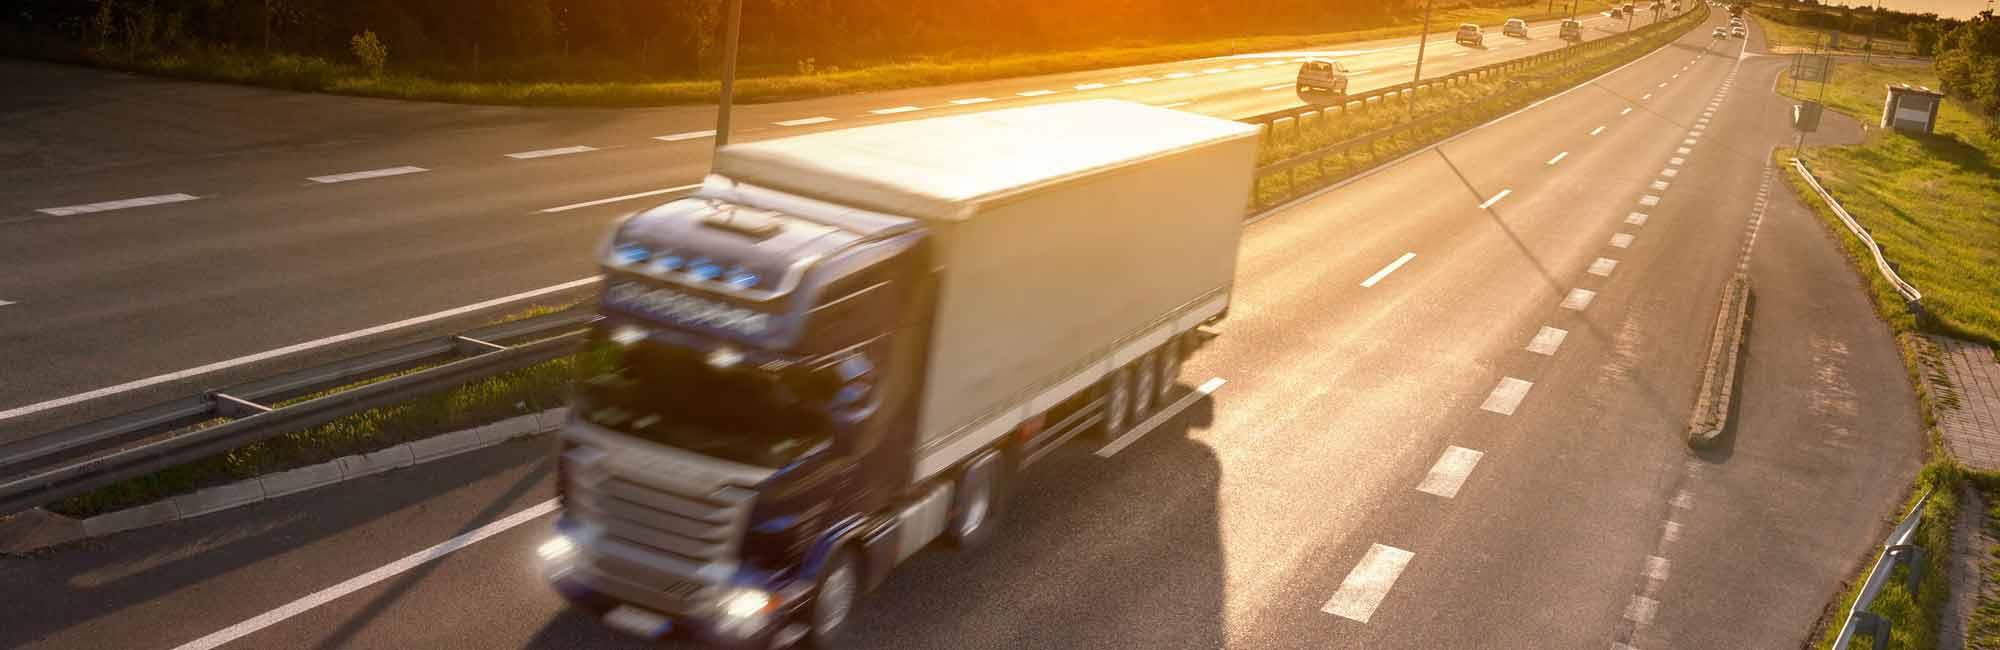 Interieurdelen op maat - Truckinterieur De Regt